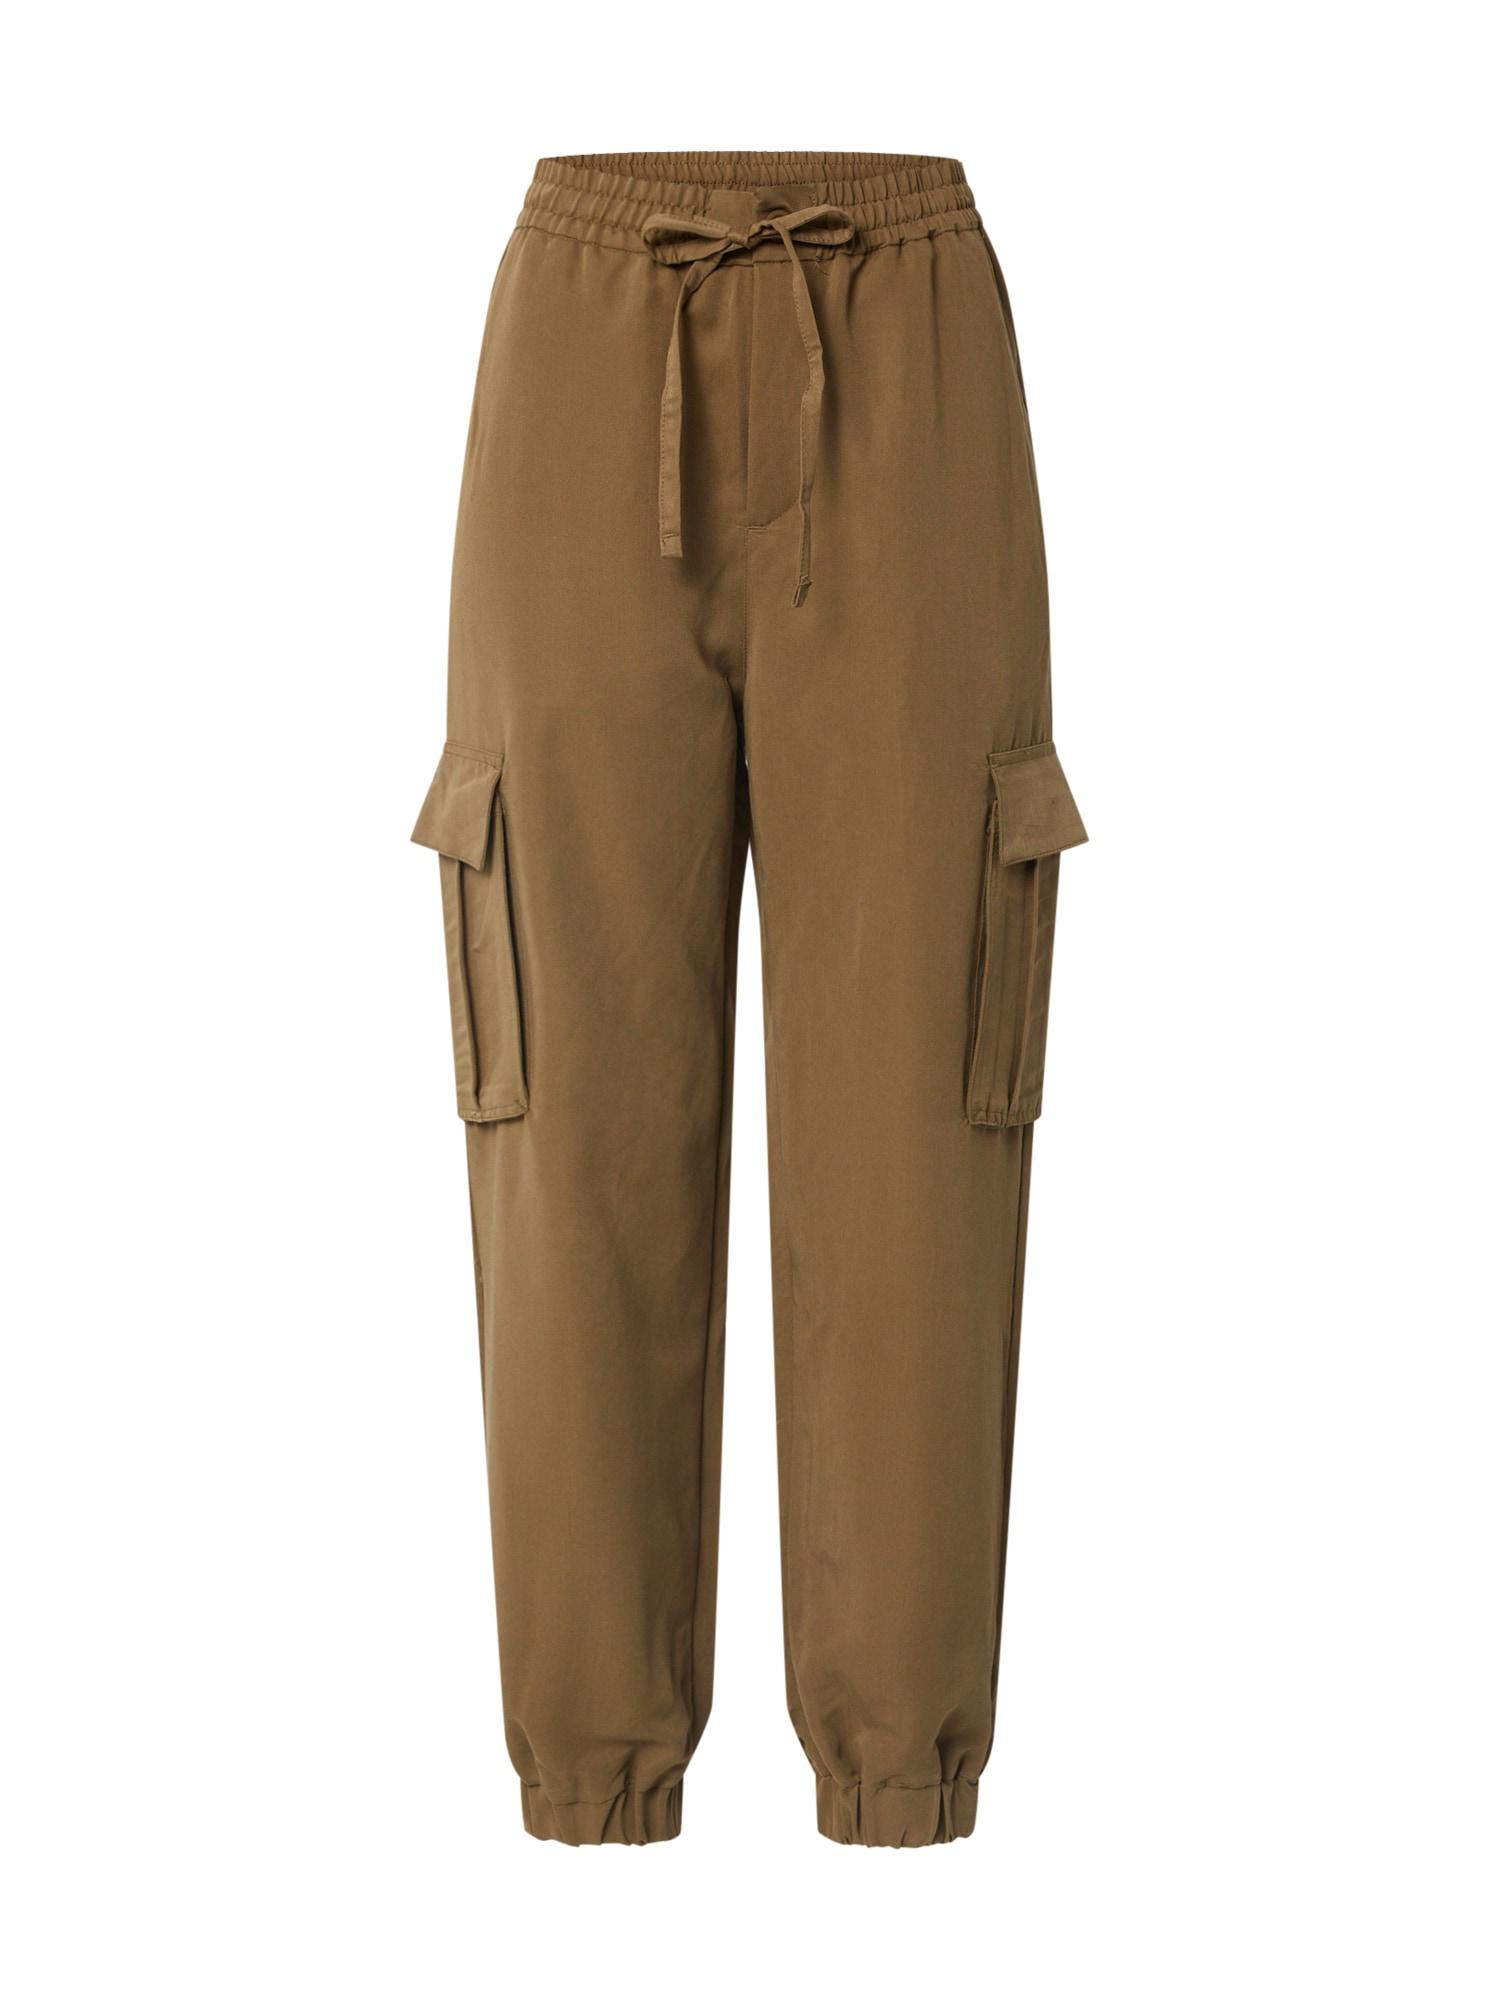 Urban Classics Laisvo stiliaus kelnės 'Ladies Viscose Twill Cargo Pants' ruda